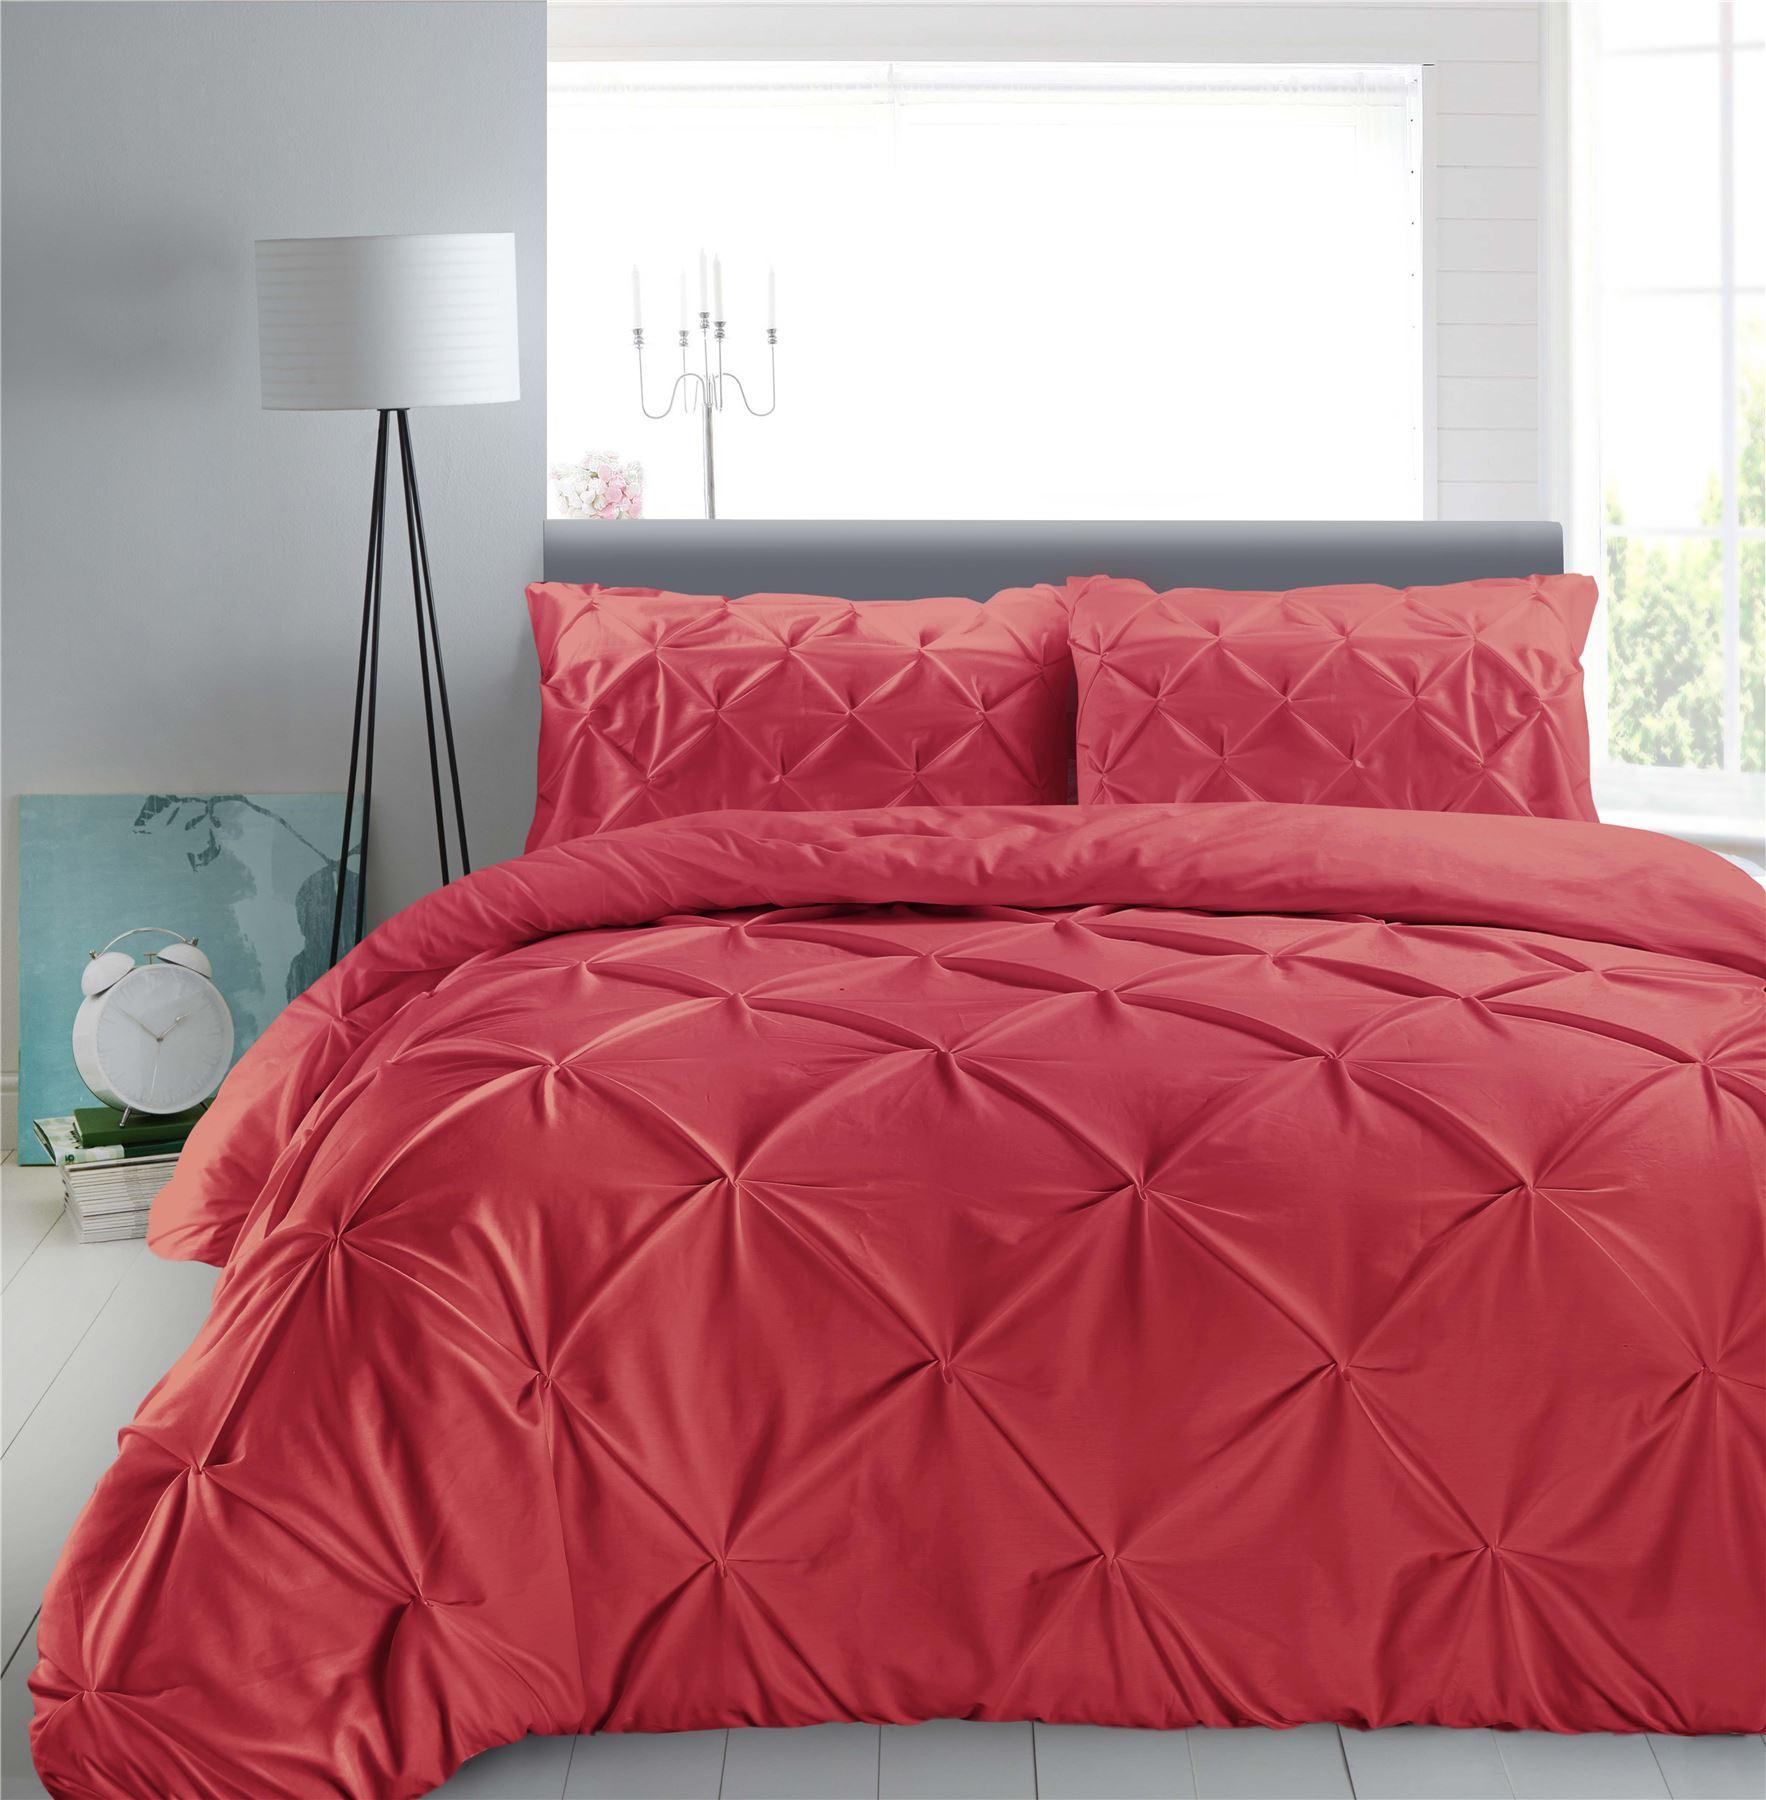 Luxury-Pure-100-Cotton-200-Thread-Pinch-Pleat-Pintuck-Puckering-Duvet-Cover-Set thumbnail 42